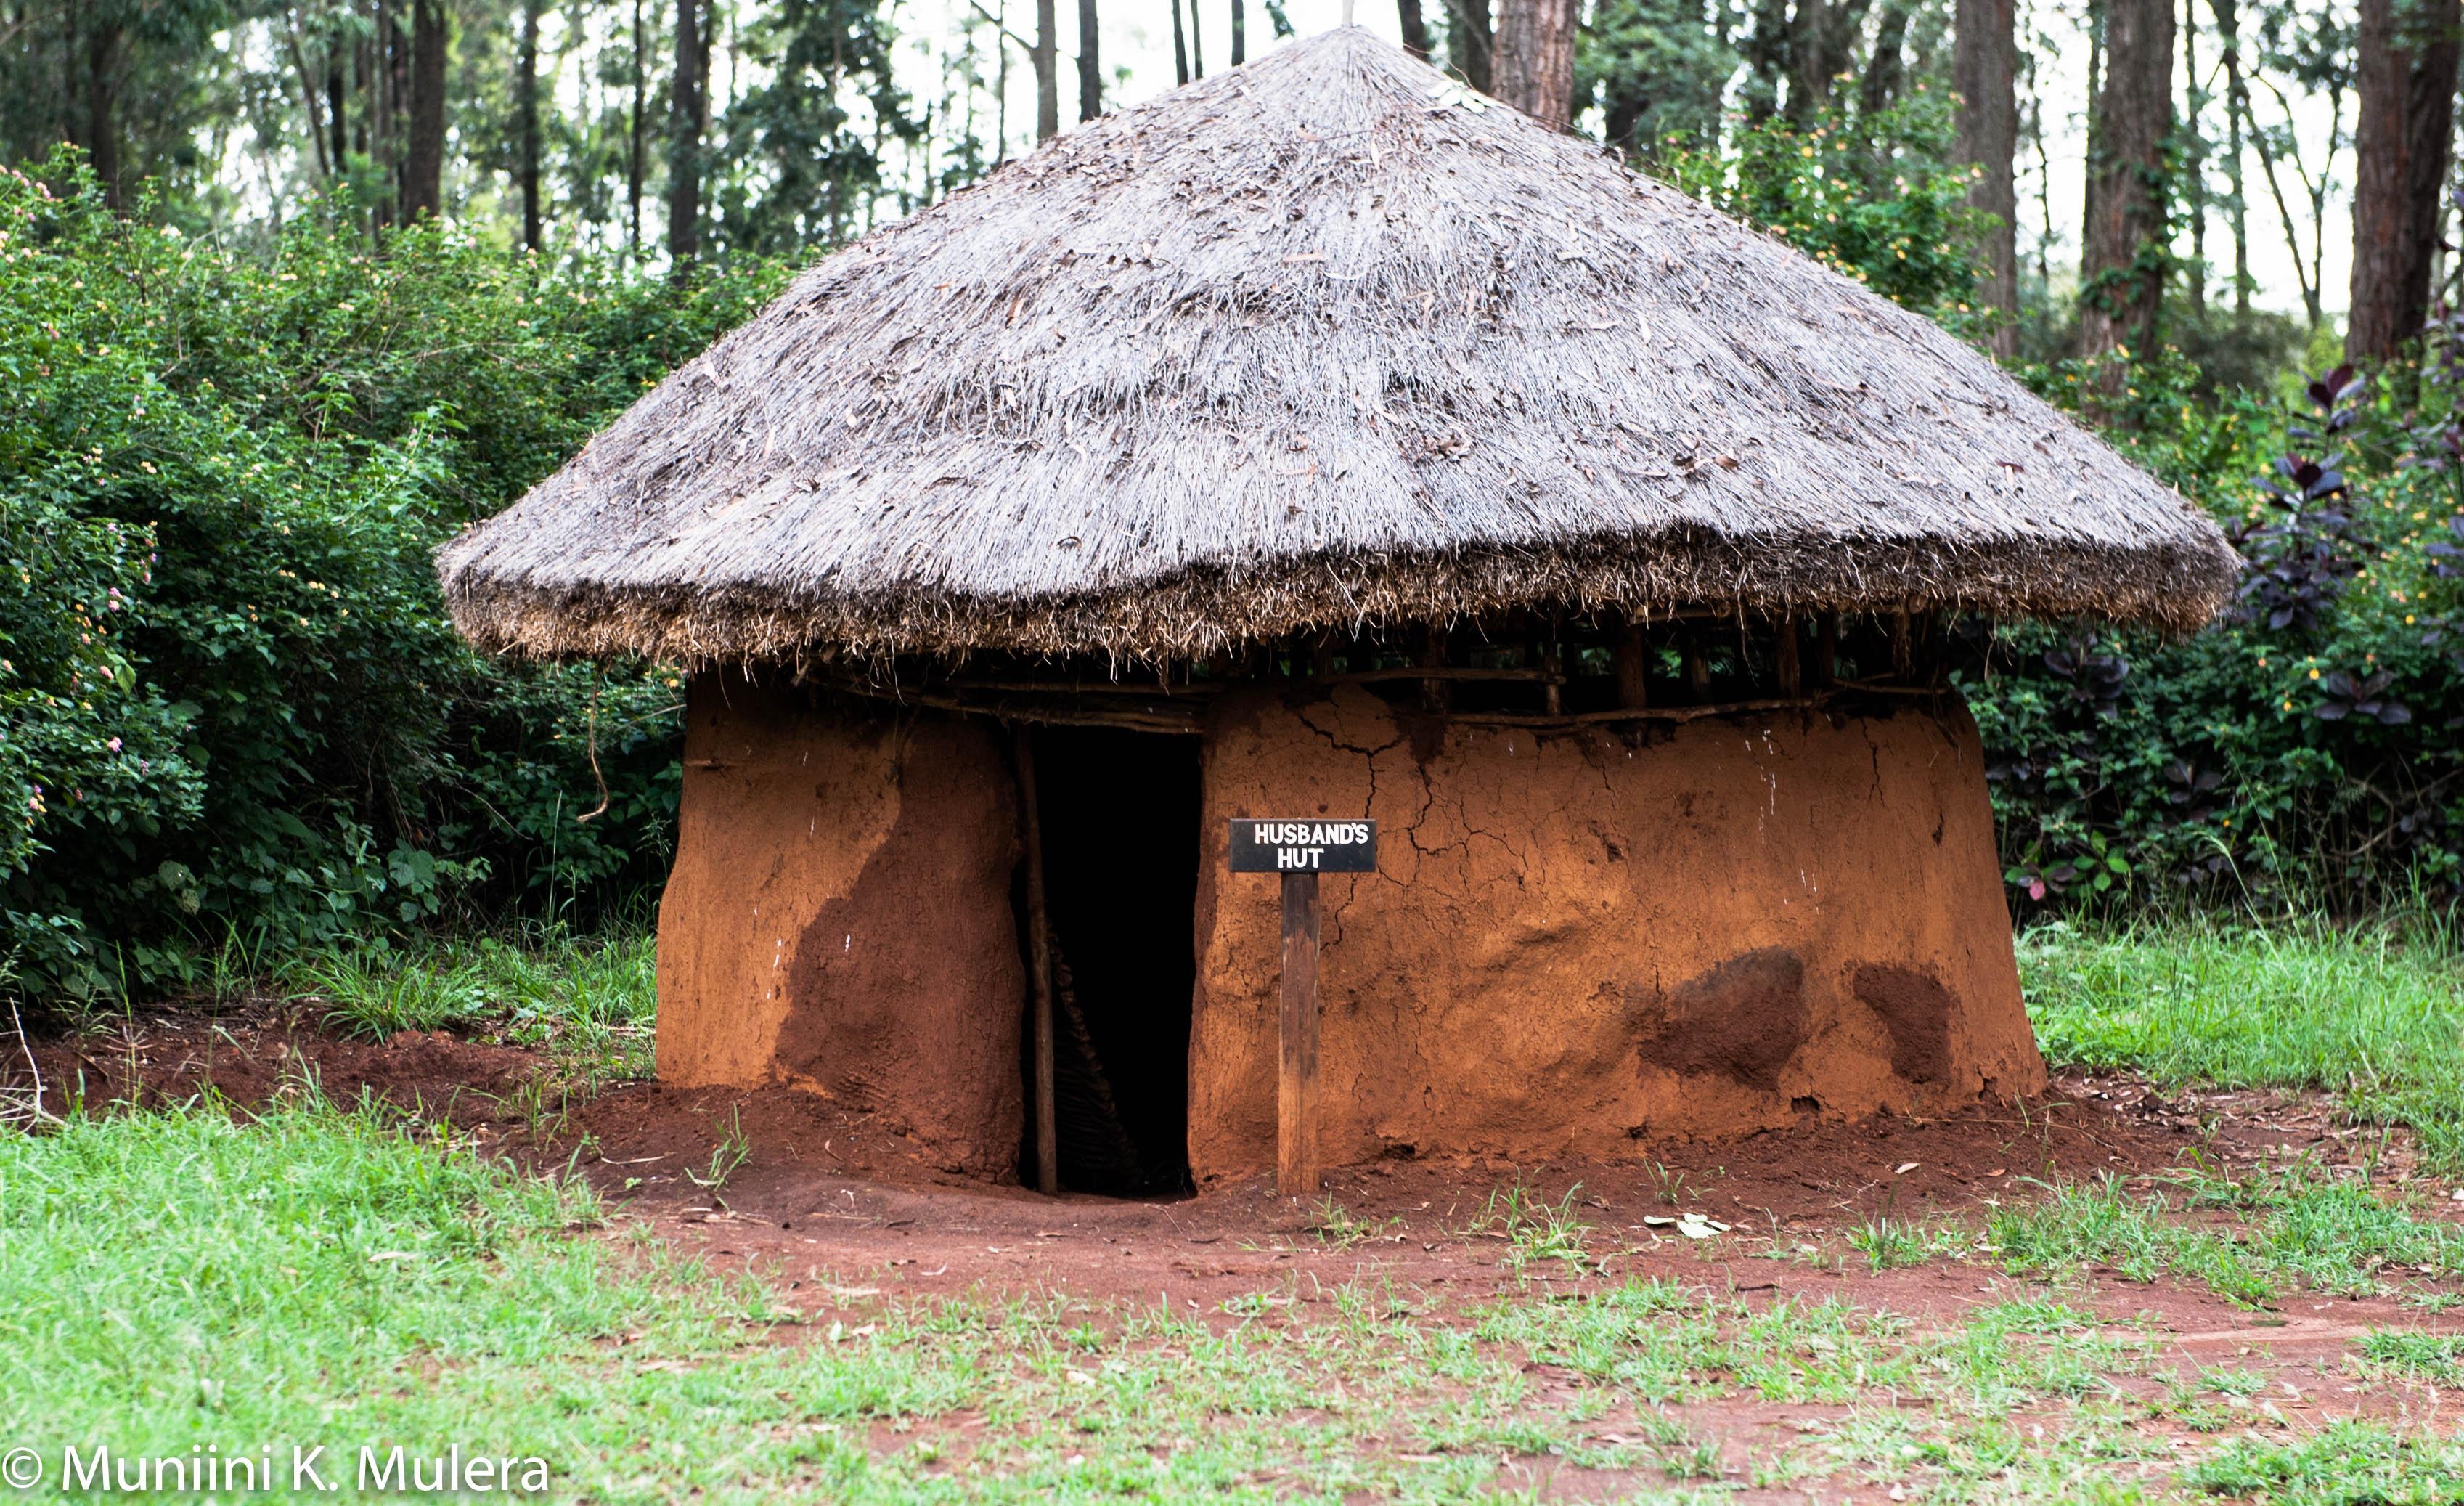 Bomas of Kenya Husband's hut